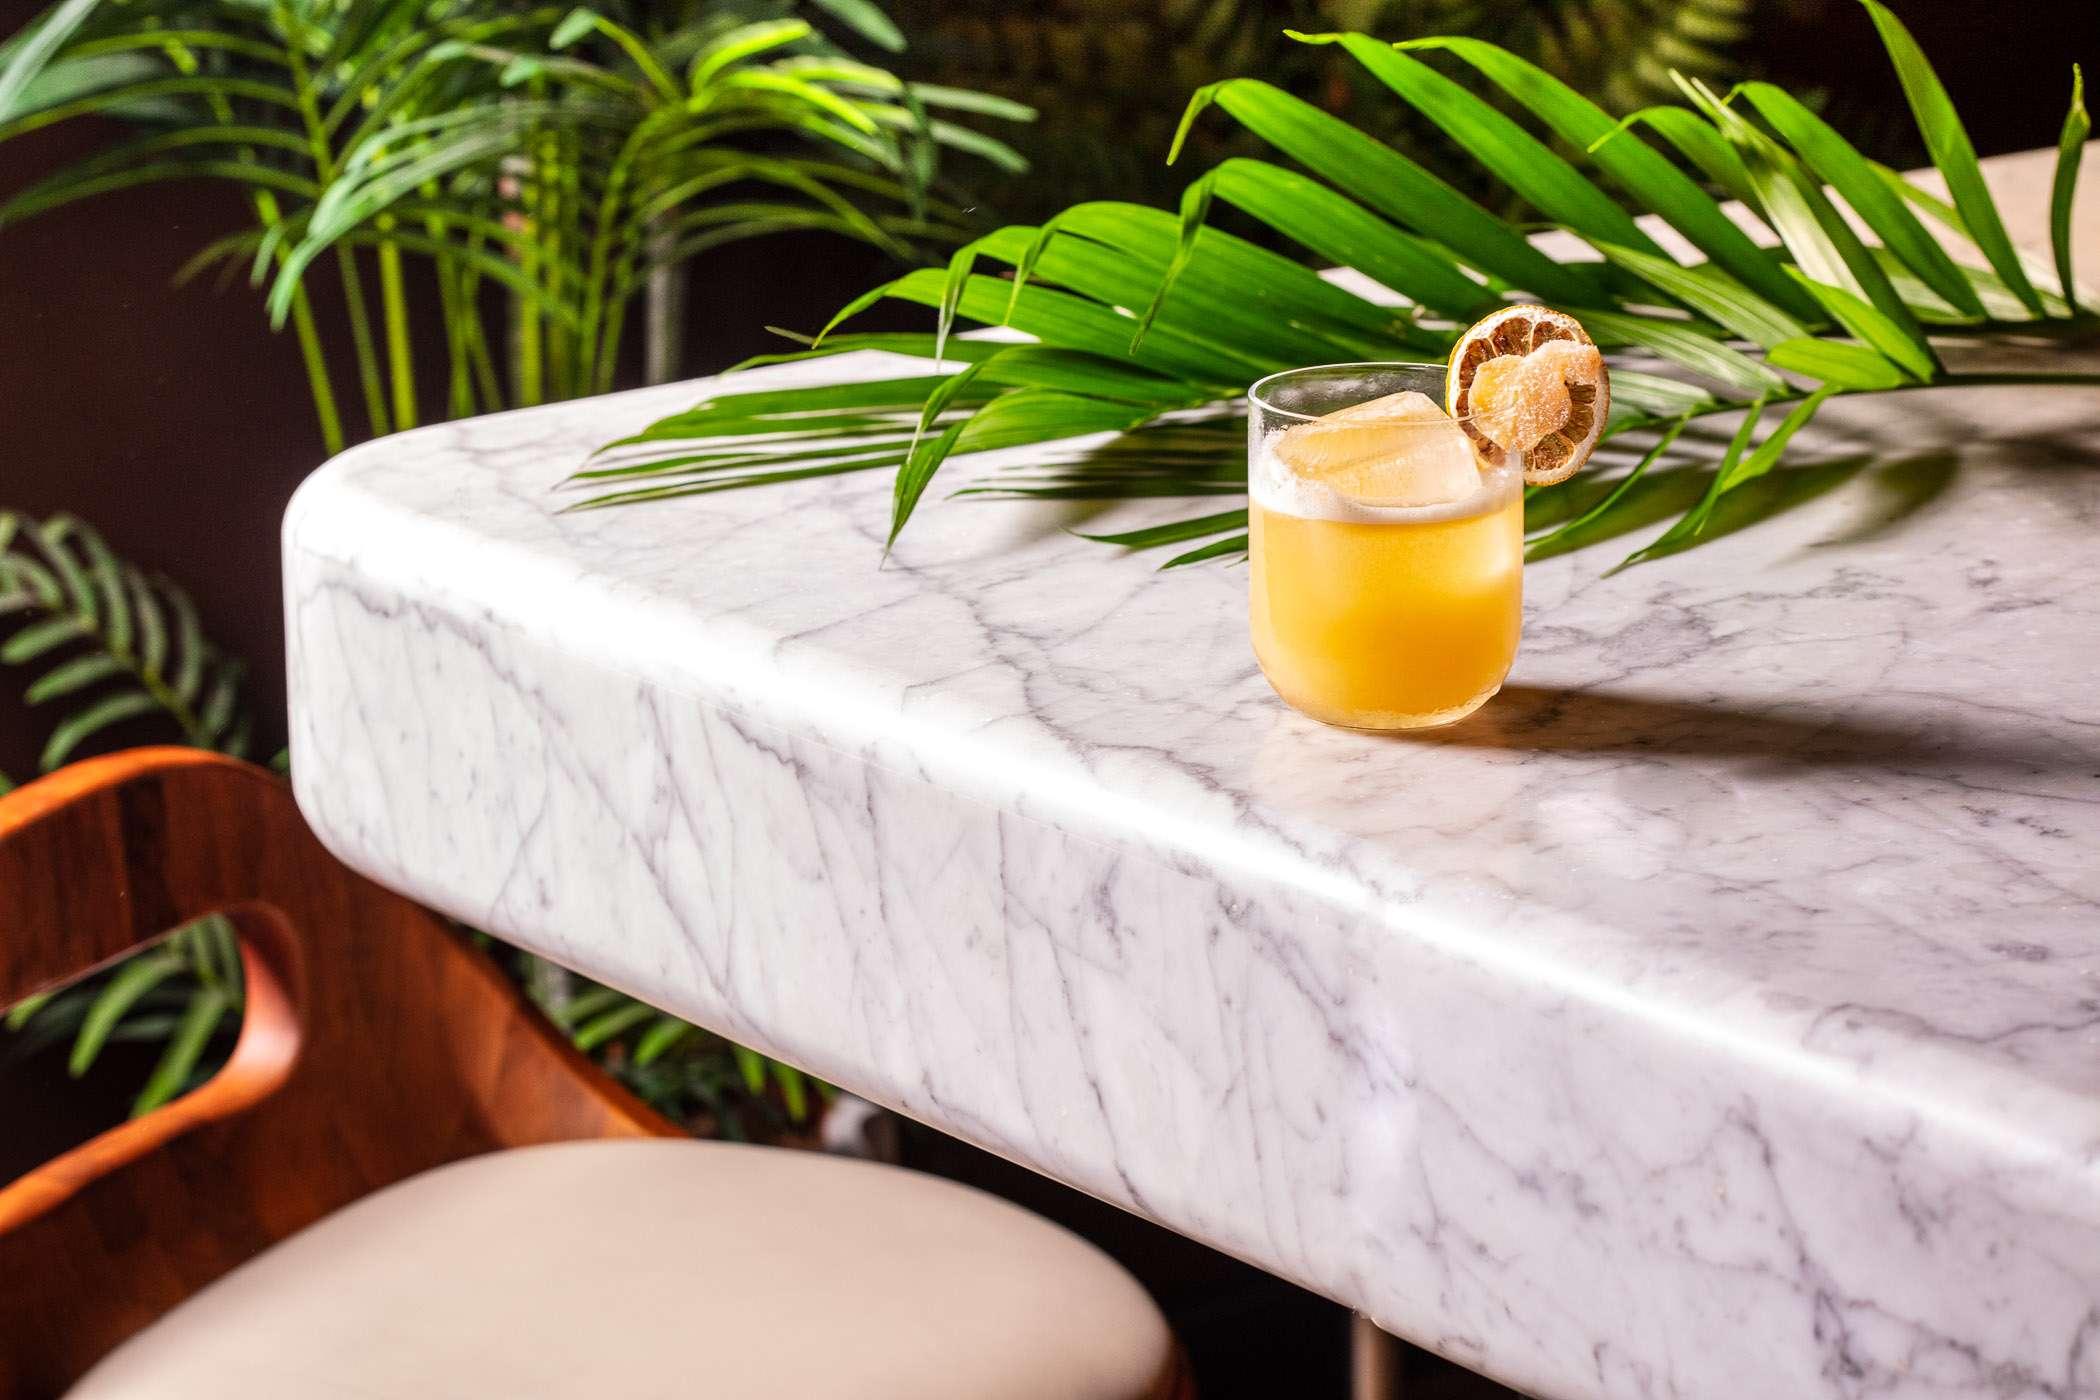 Bar Photography done for Scarpetta in Miami.